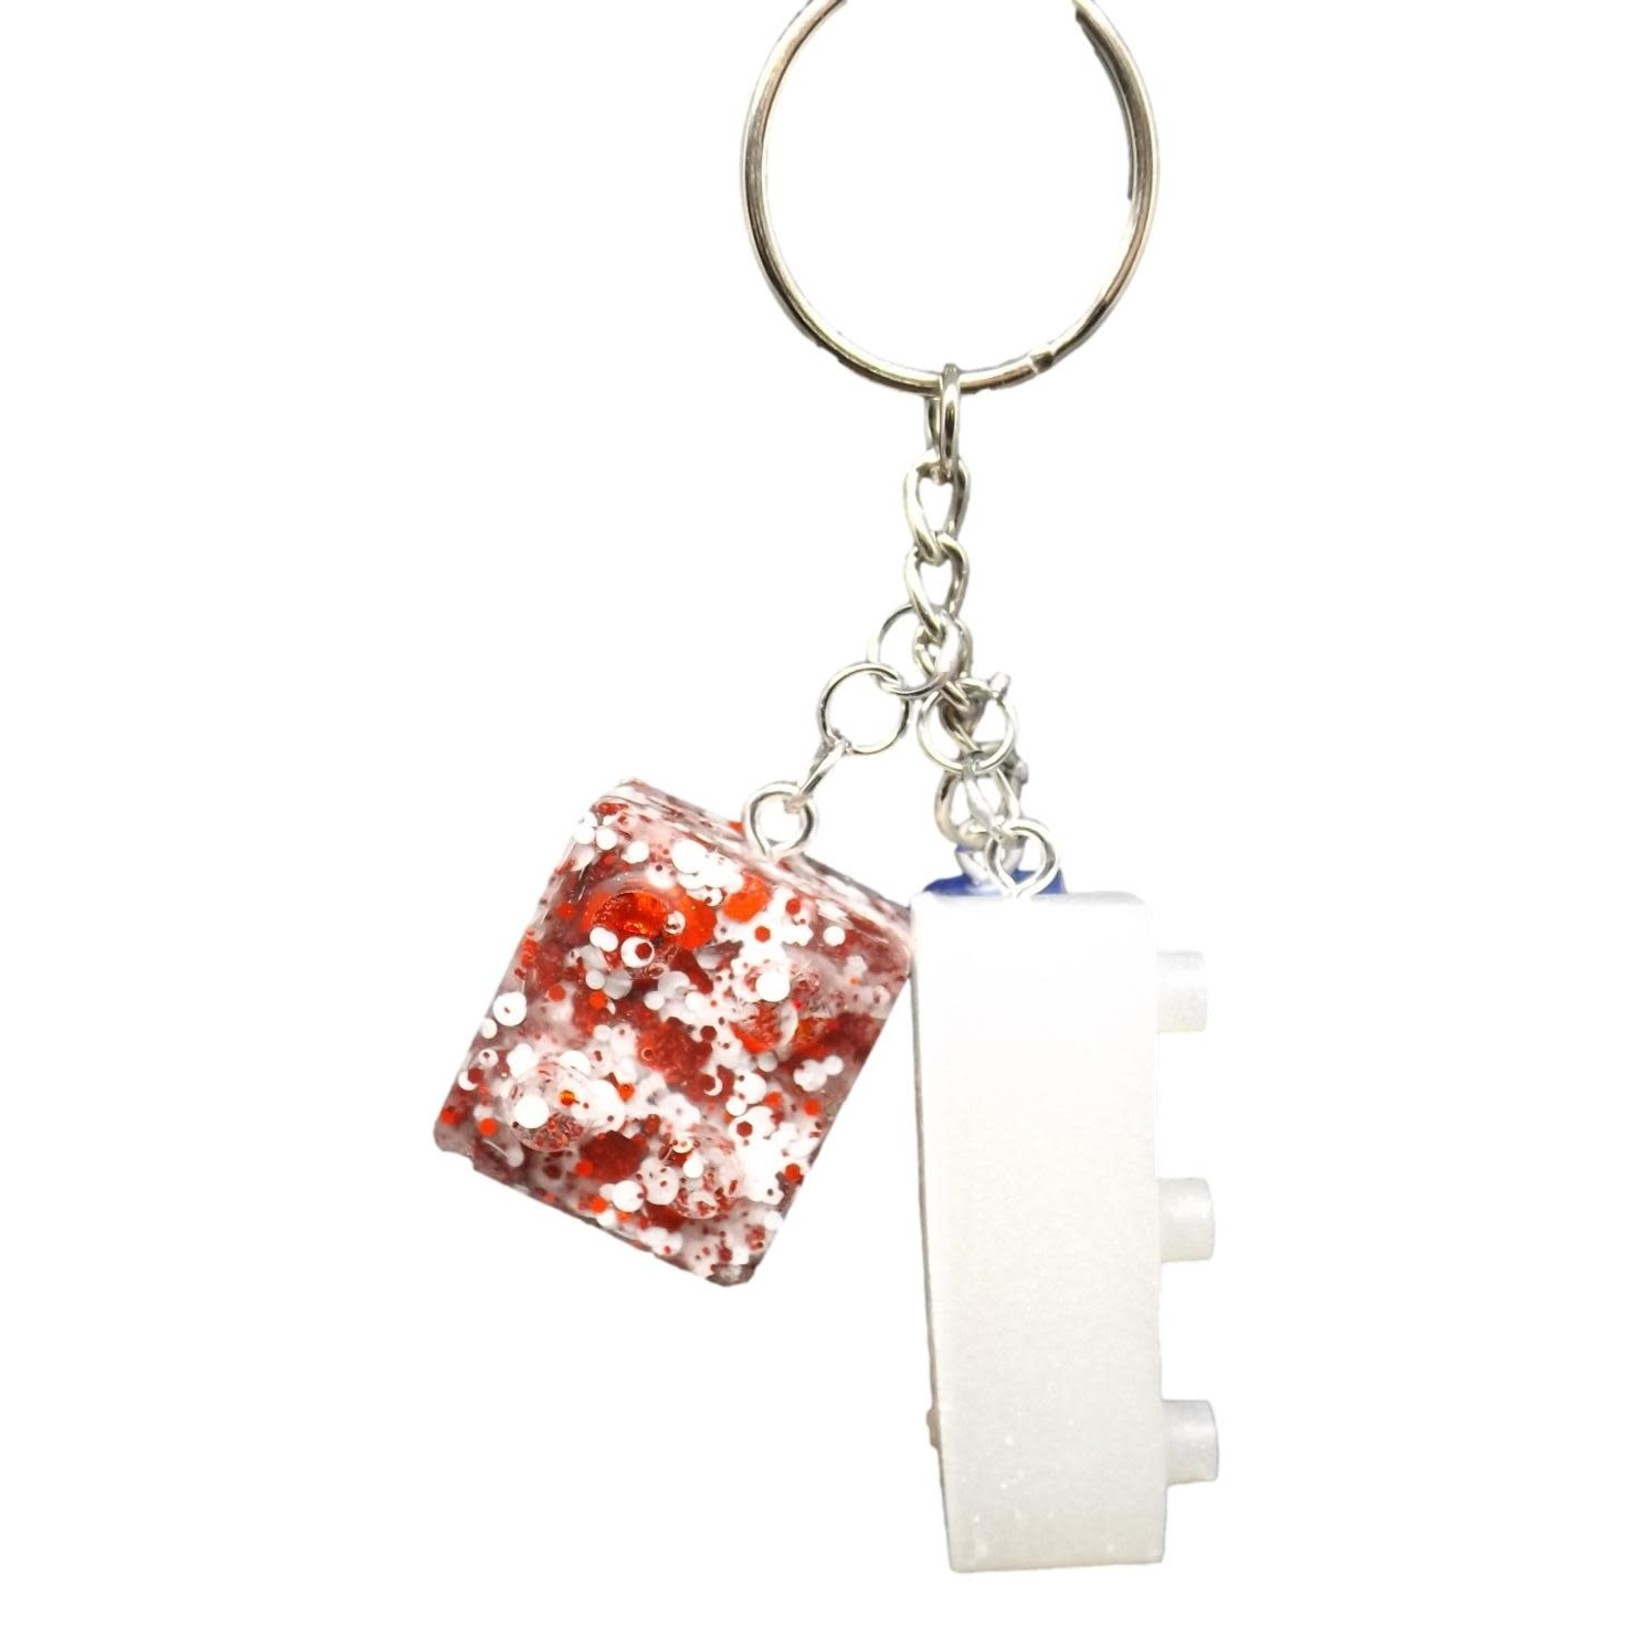 East Coast Sirens Red, White & Blue Lego Key Chain